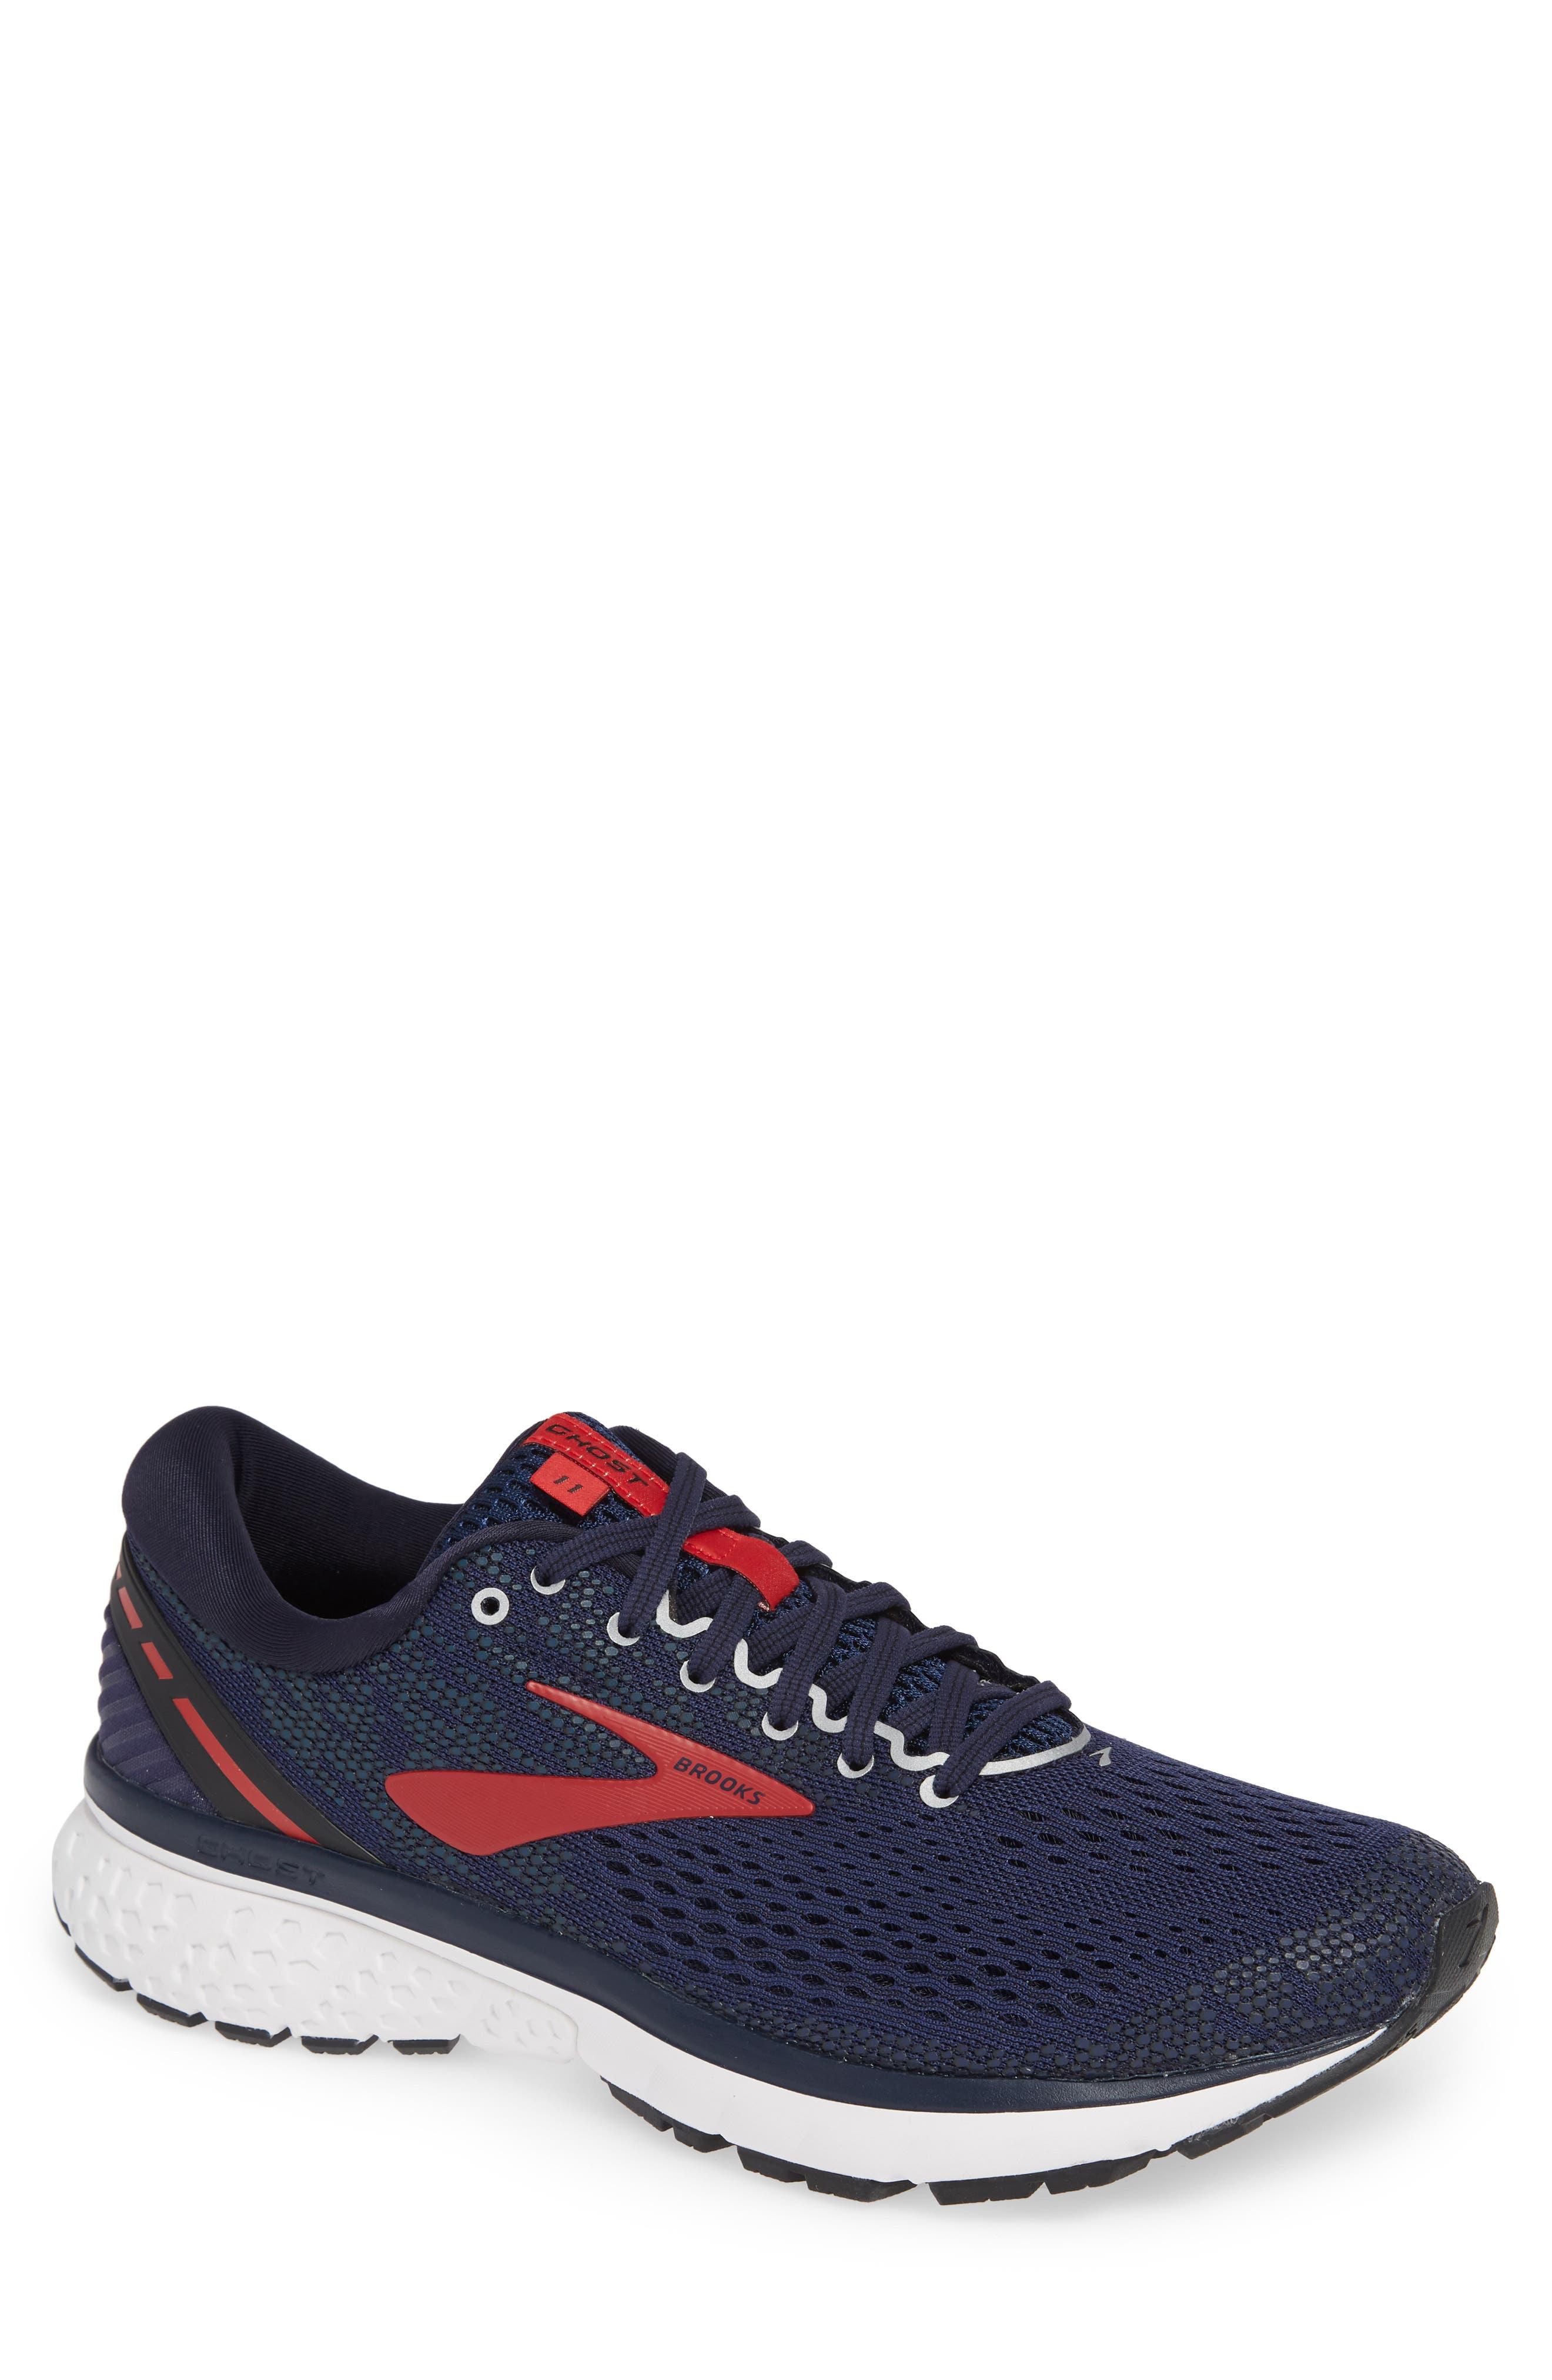 a8cdea98fe7b8 Brooks for Men  Running   Walking Shoes